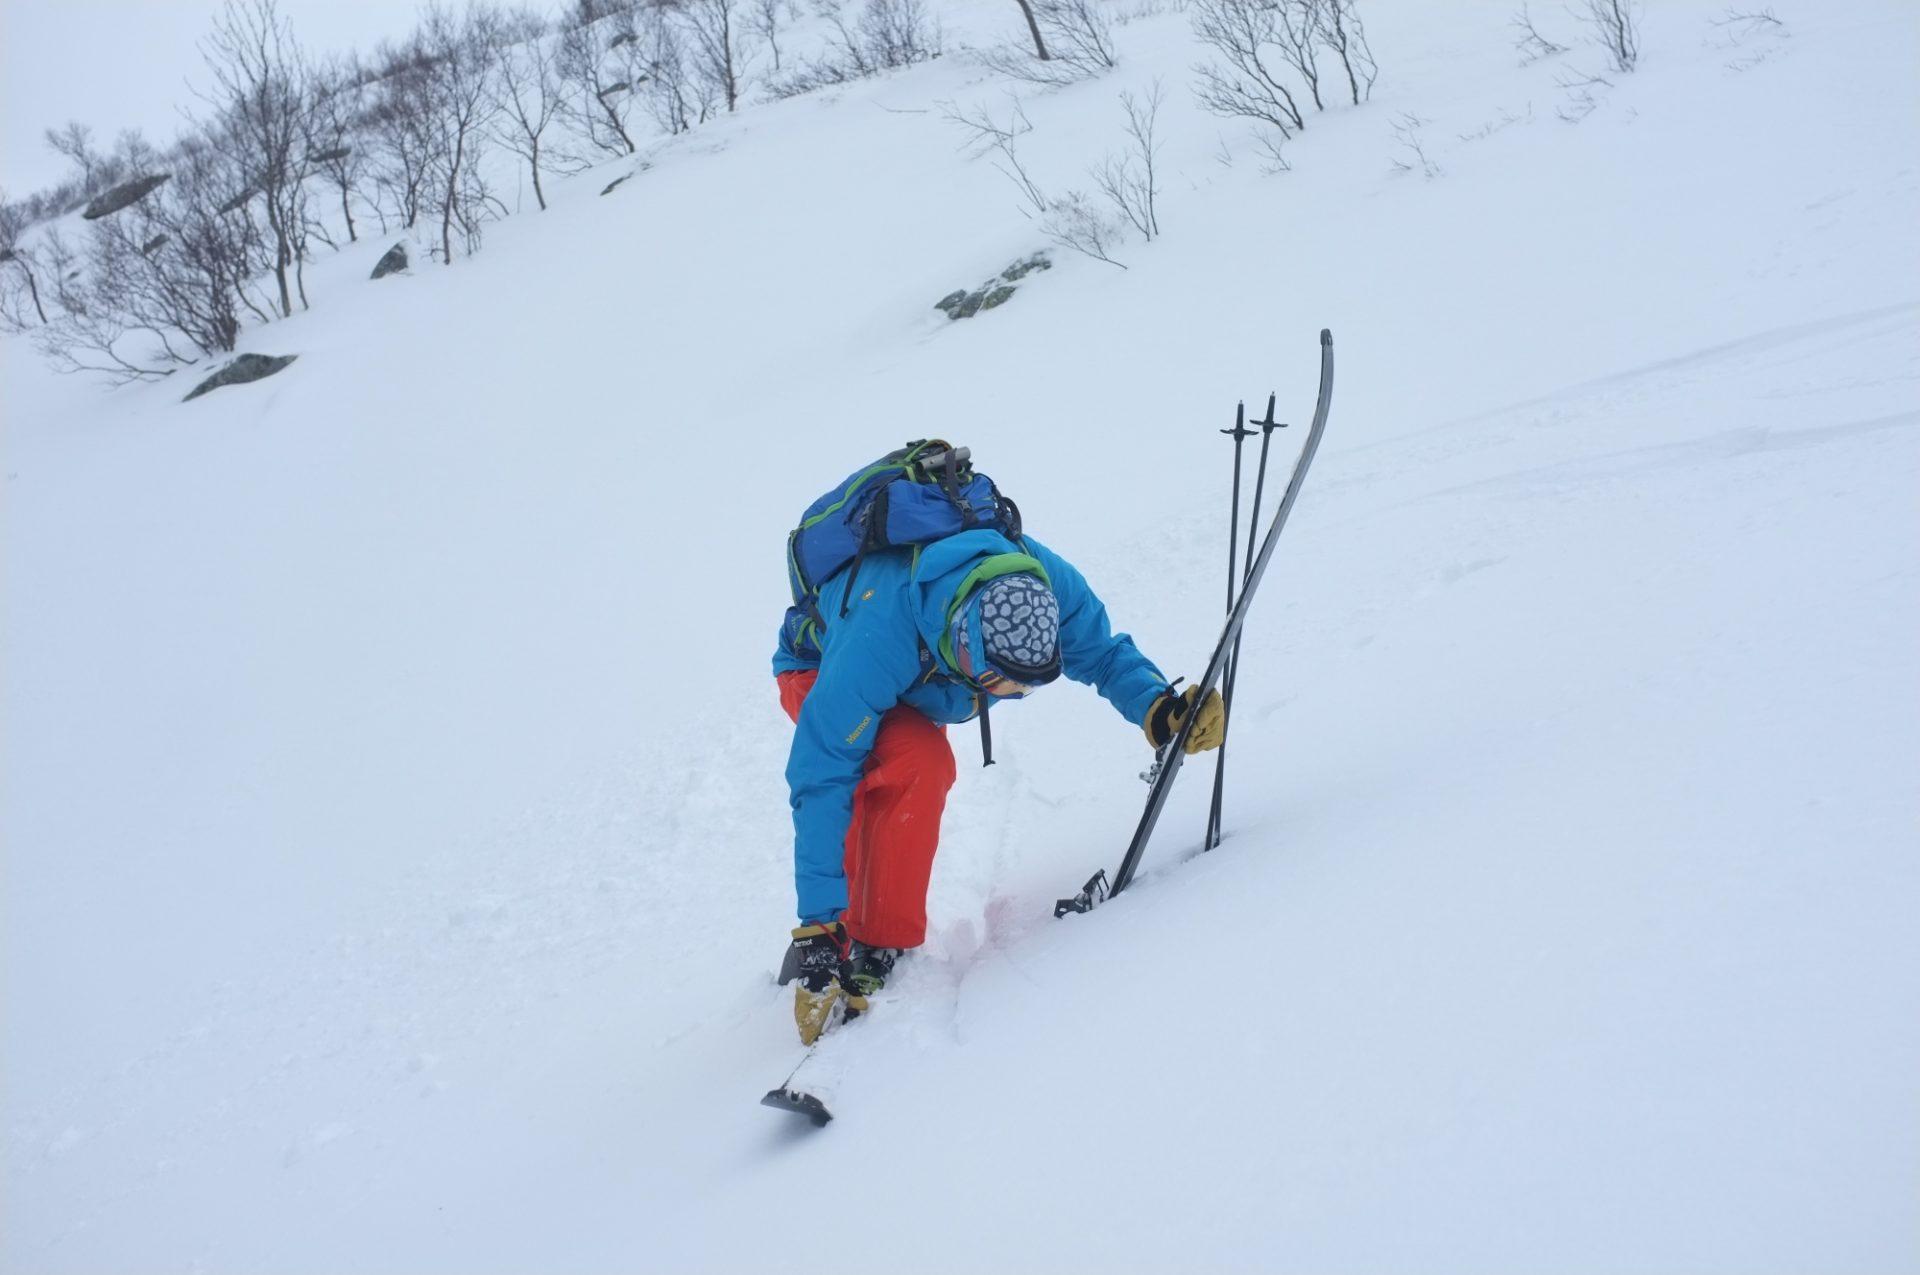 Bergsteigertipp Ski ausziehen 3 I (c) Peter Plattner